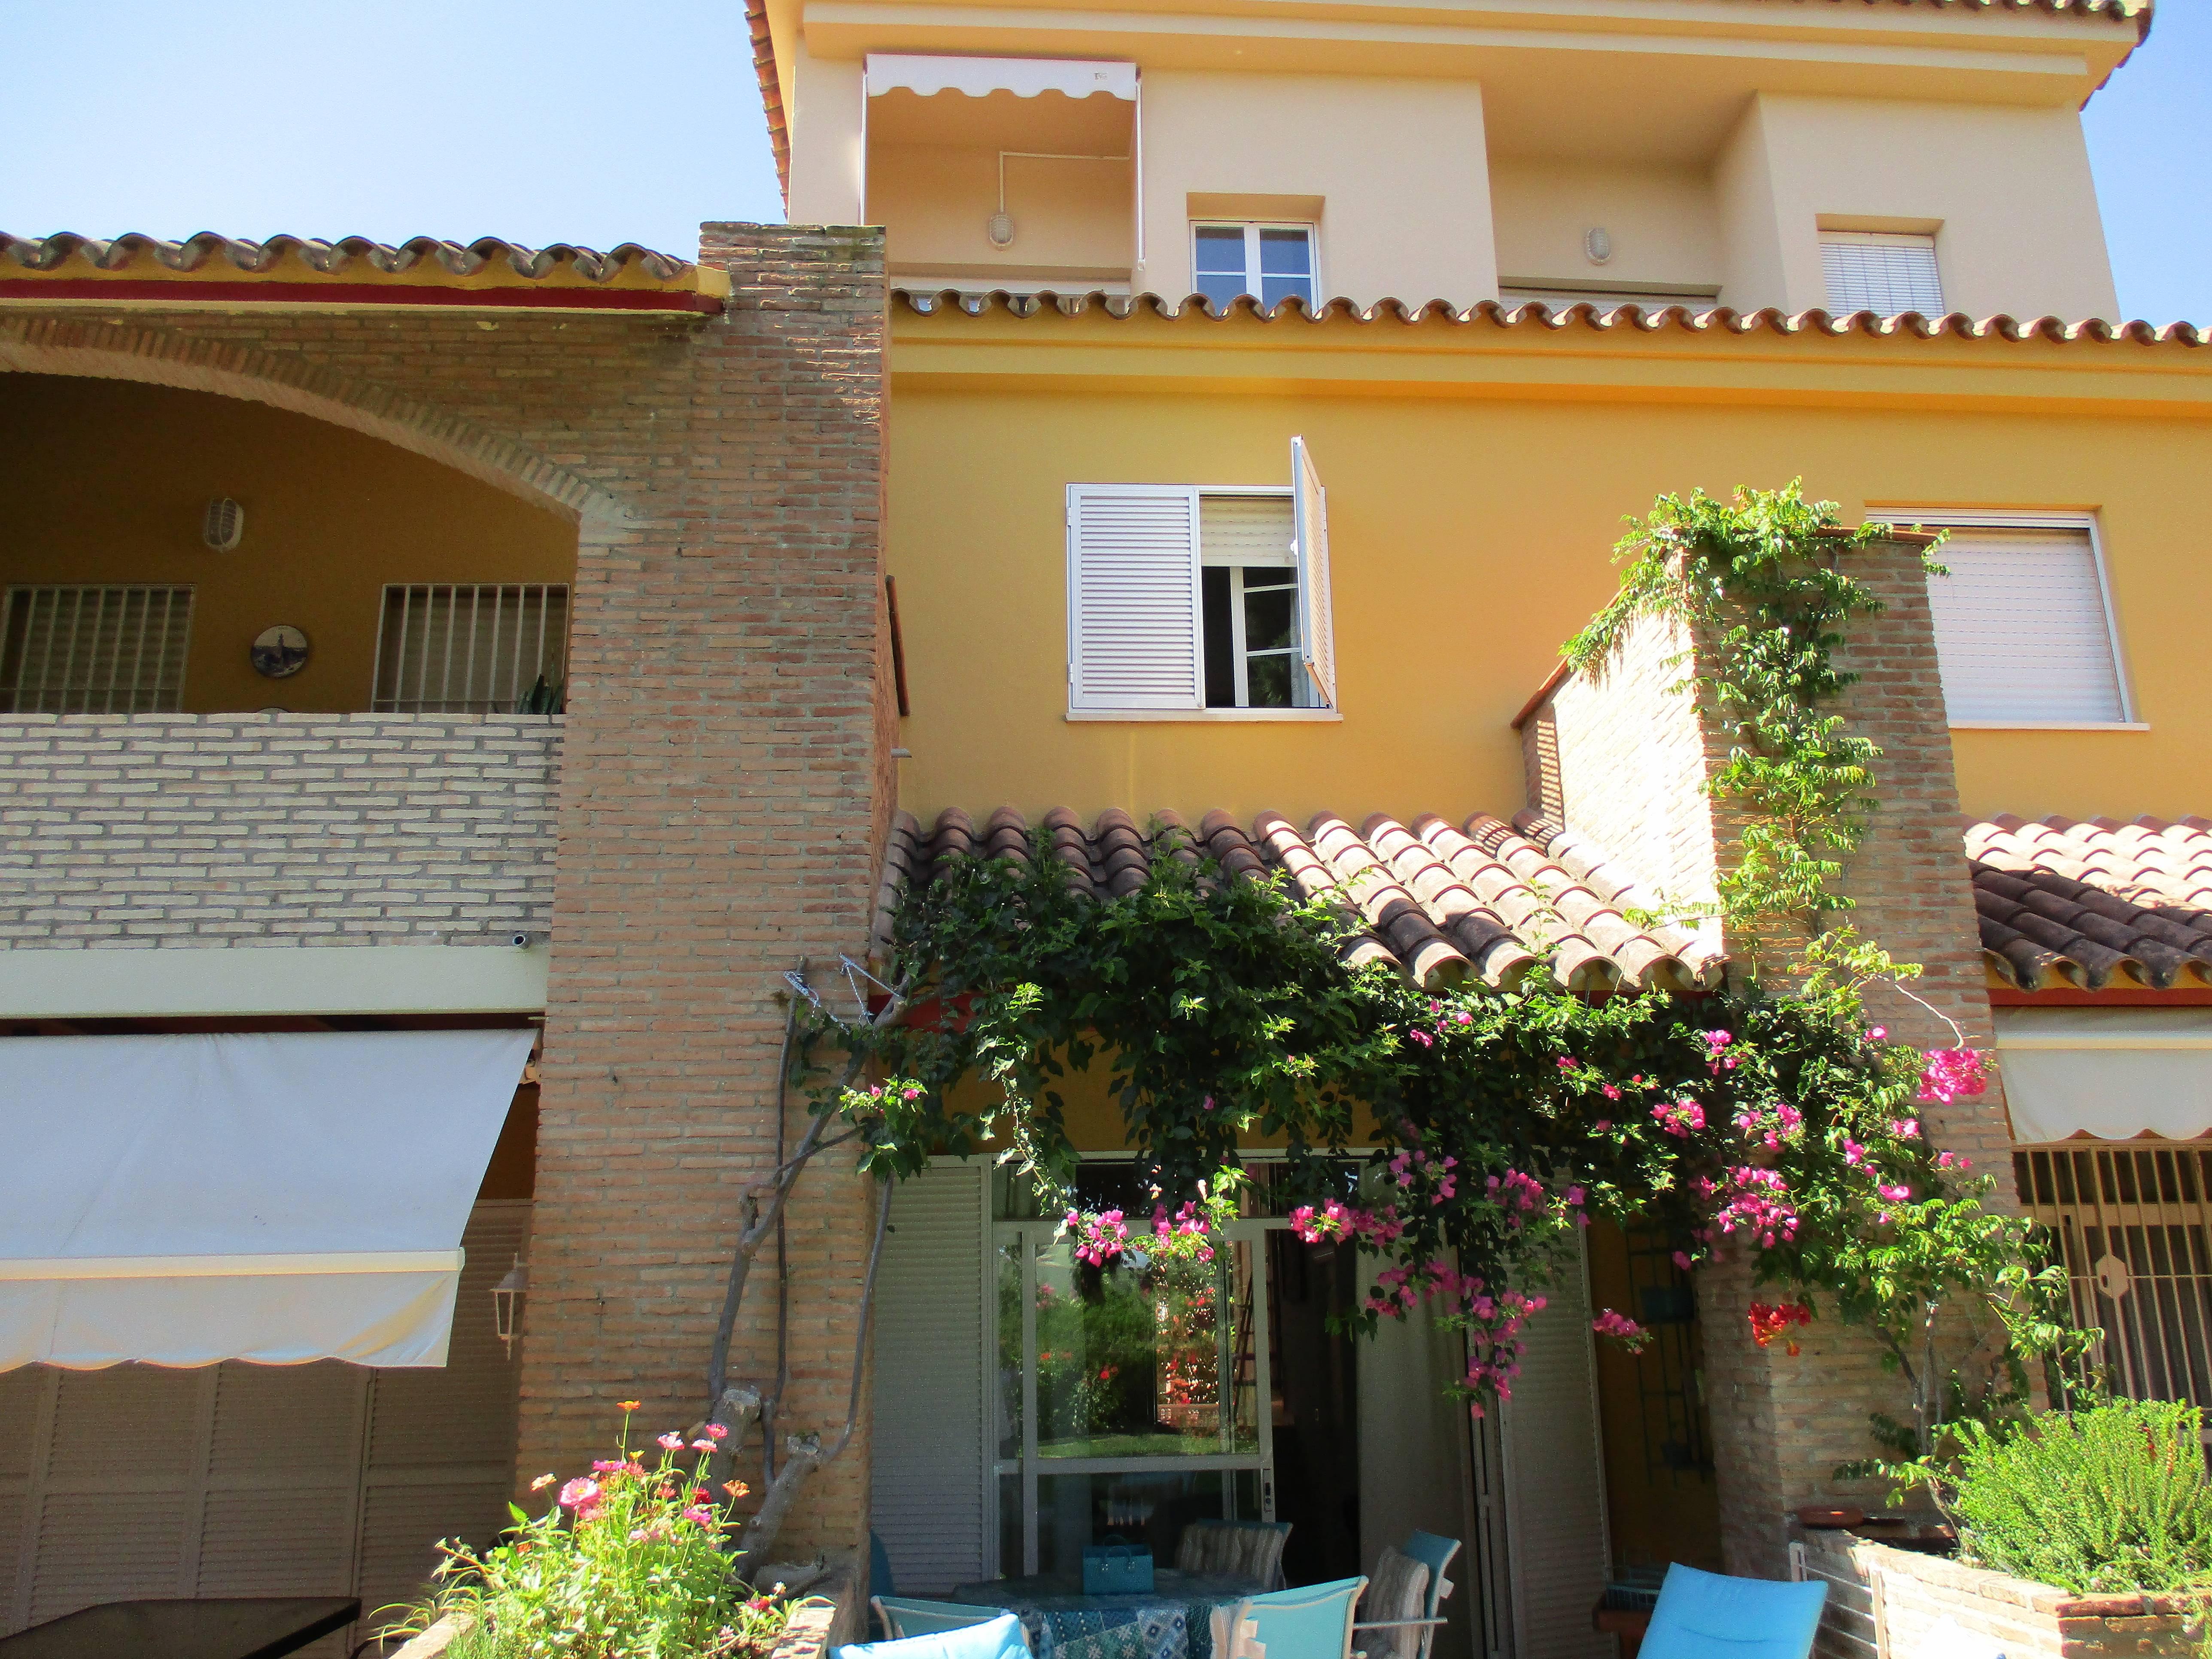 Casa de 3 habitaciones a 800 m de la playa islantilla i - Rentalia islantilla ...